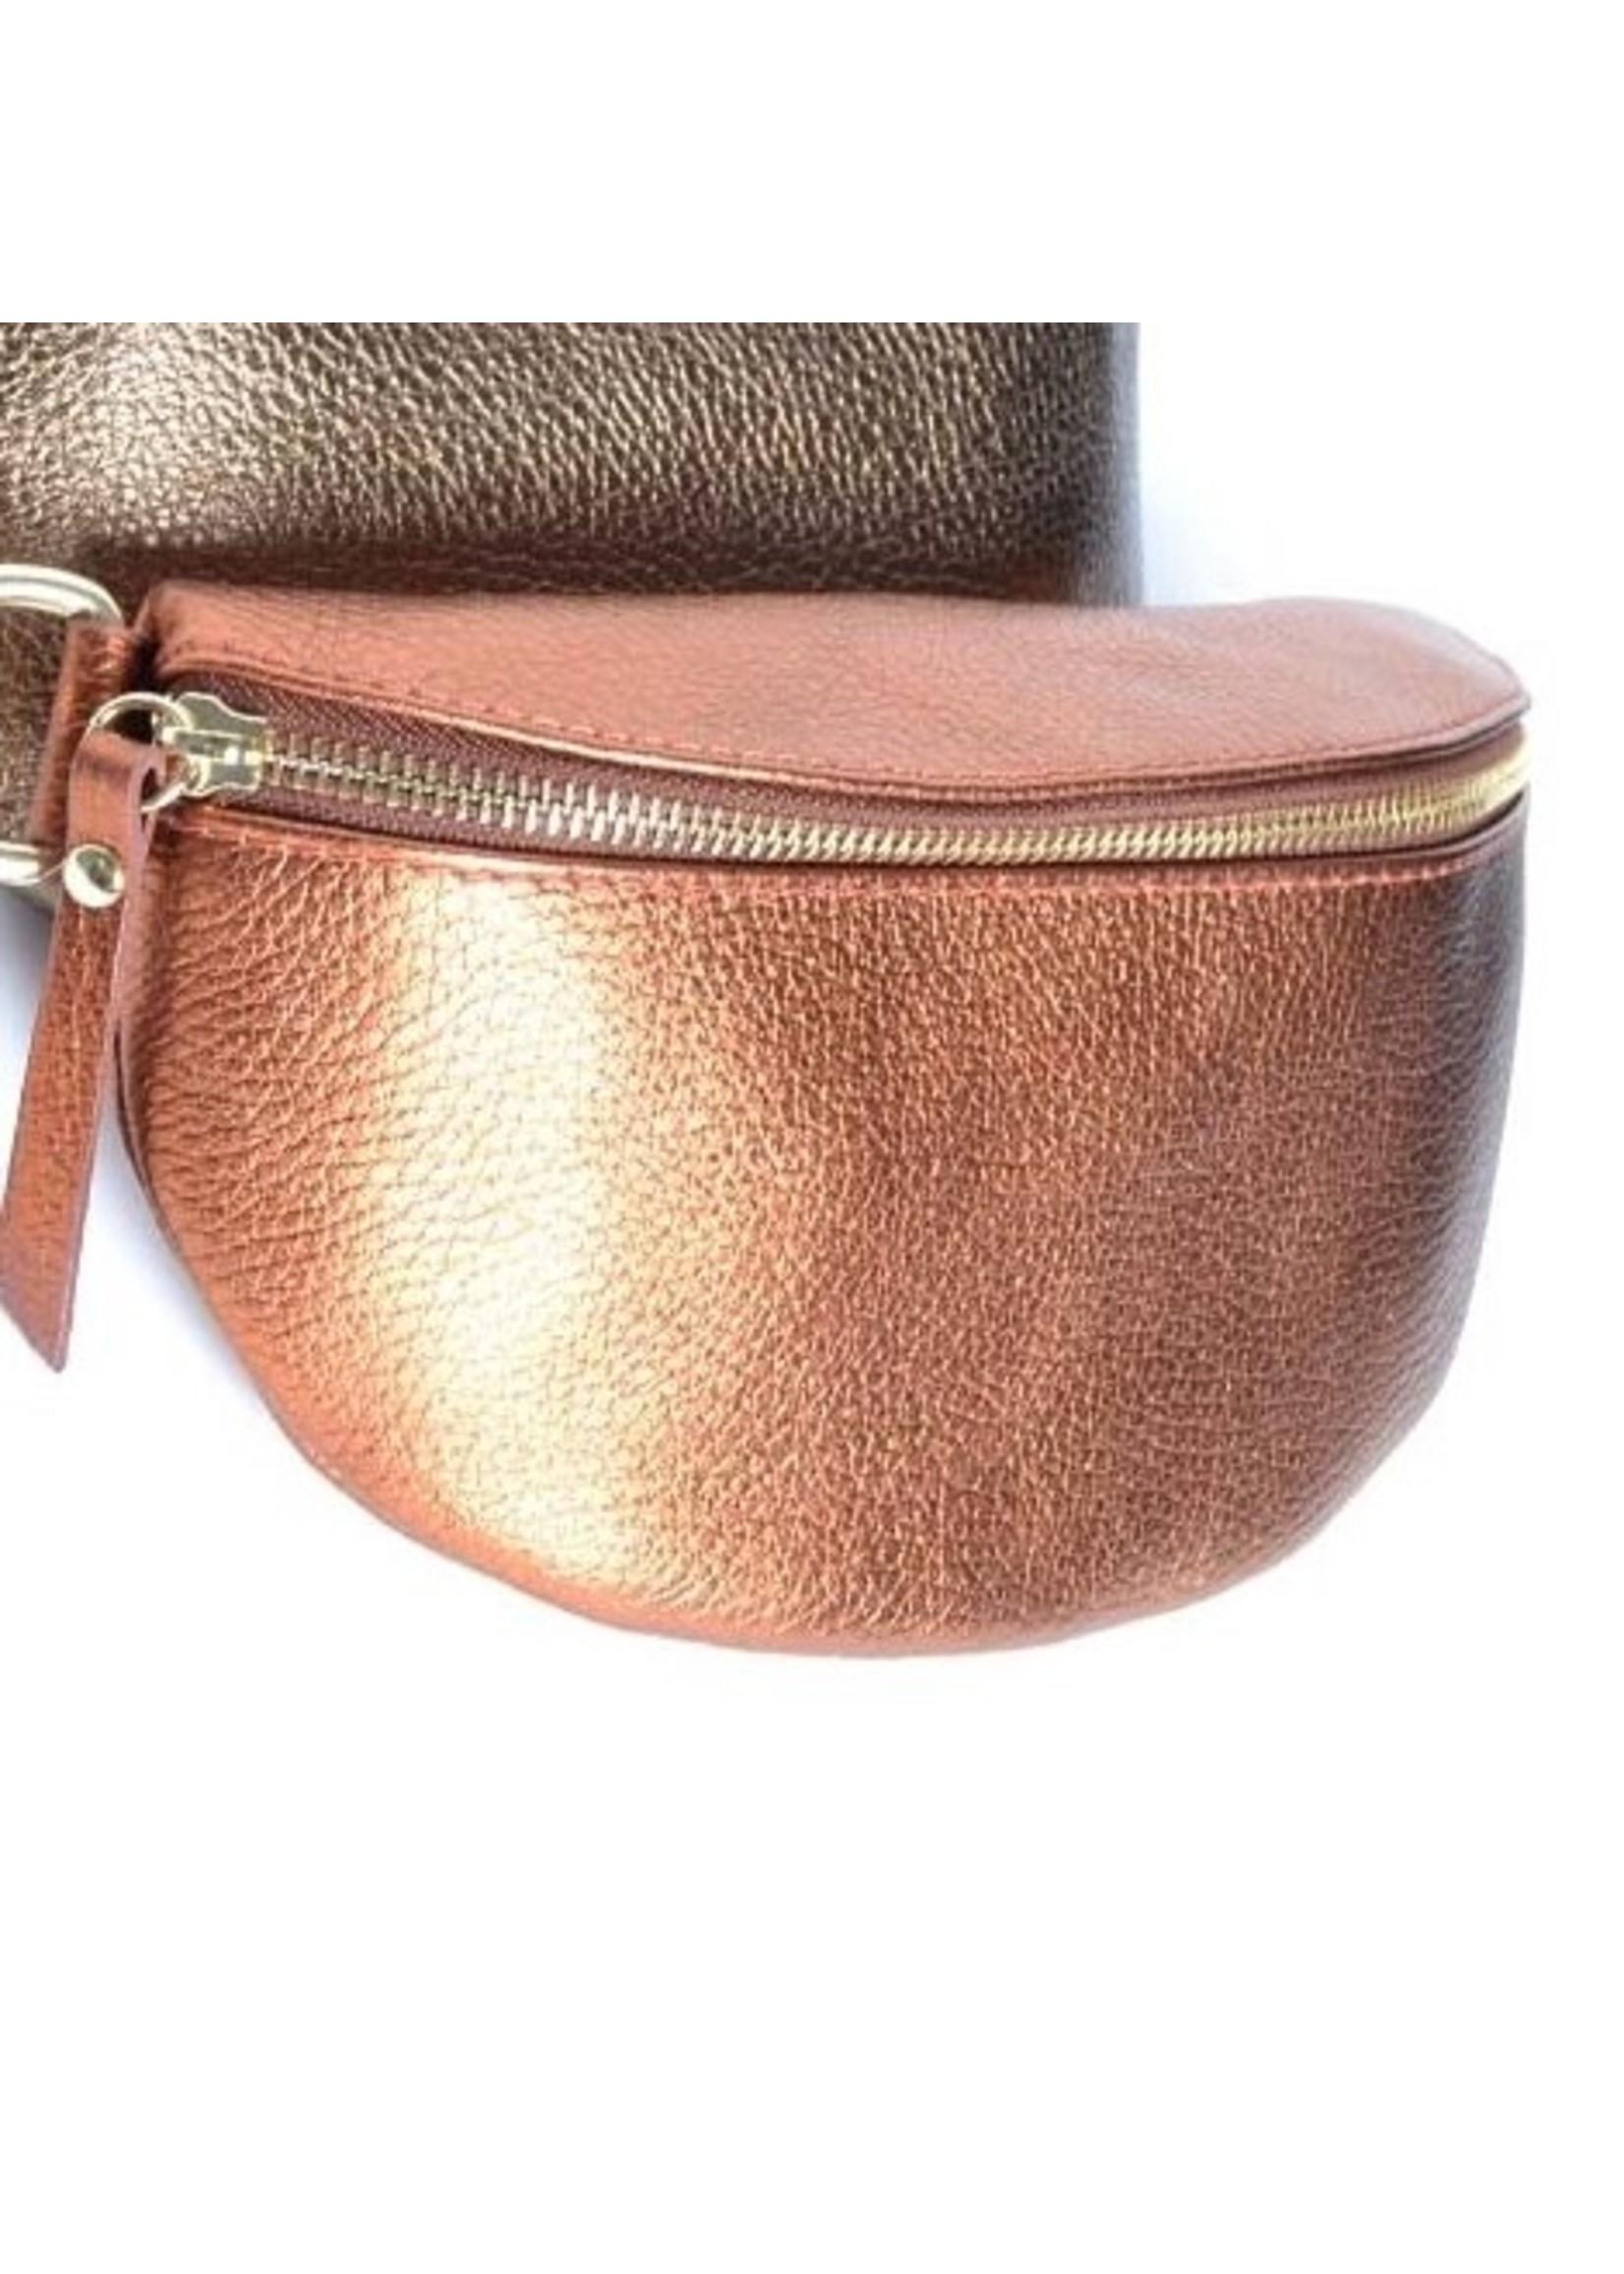 Giuliano Bum bag Metallic koper